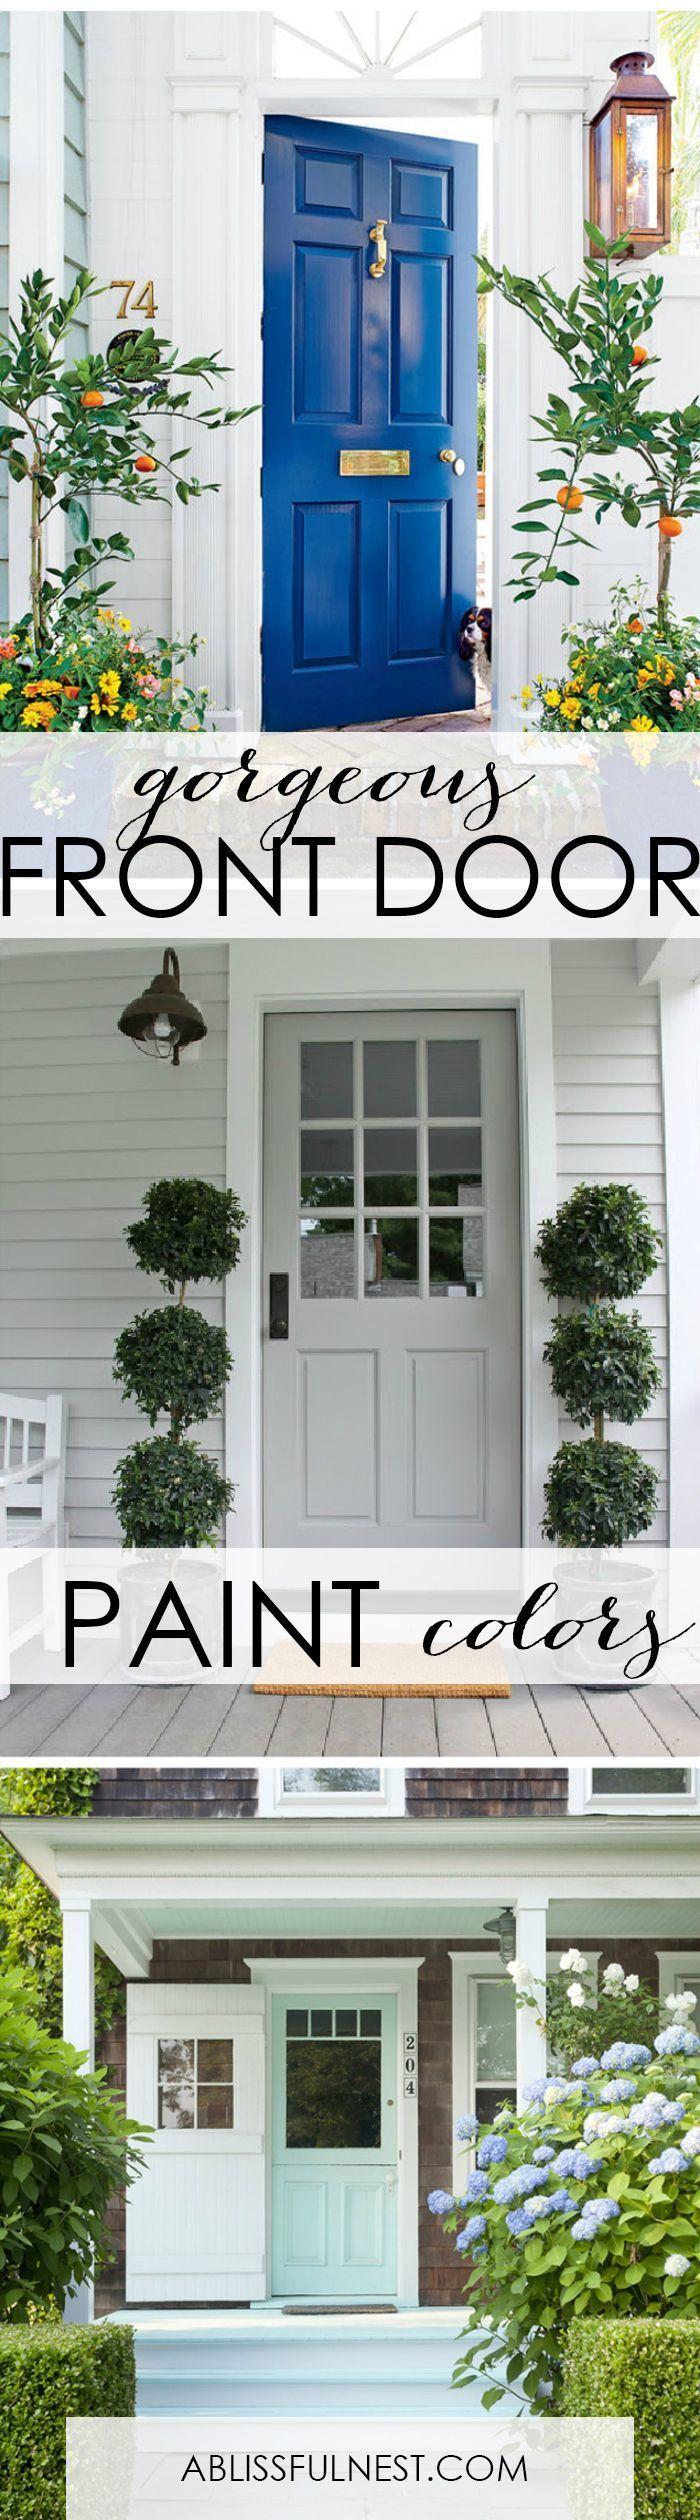 best 25 front door painting ideas on pinterest front door paint colors door paint colors and. Black Bedroom Furniture Sets. Home Design Ideas